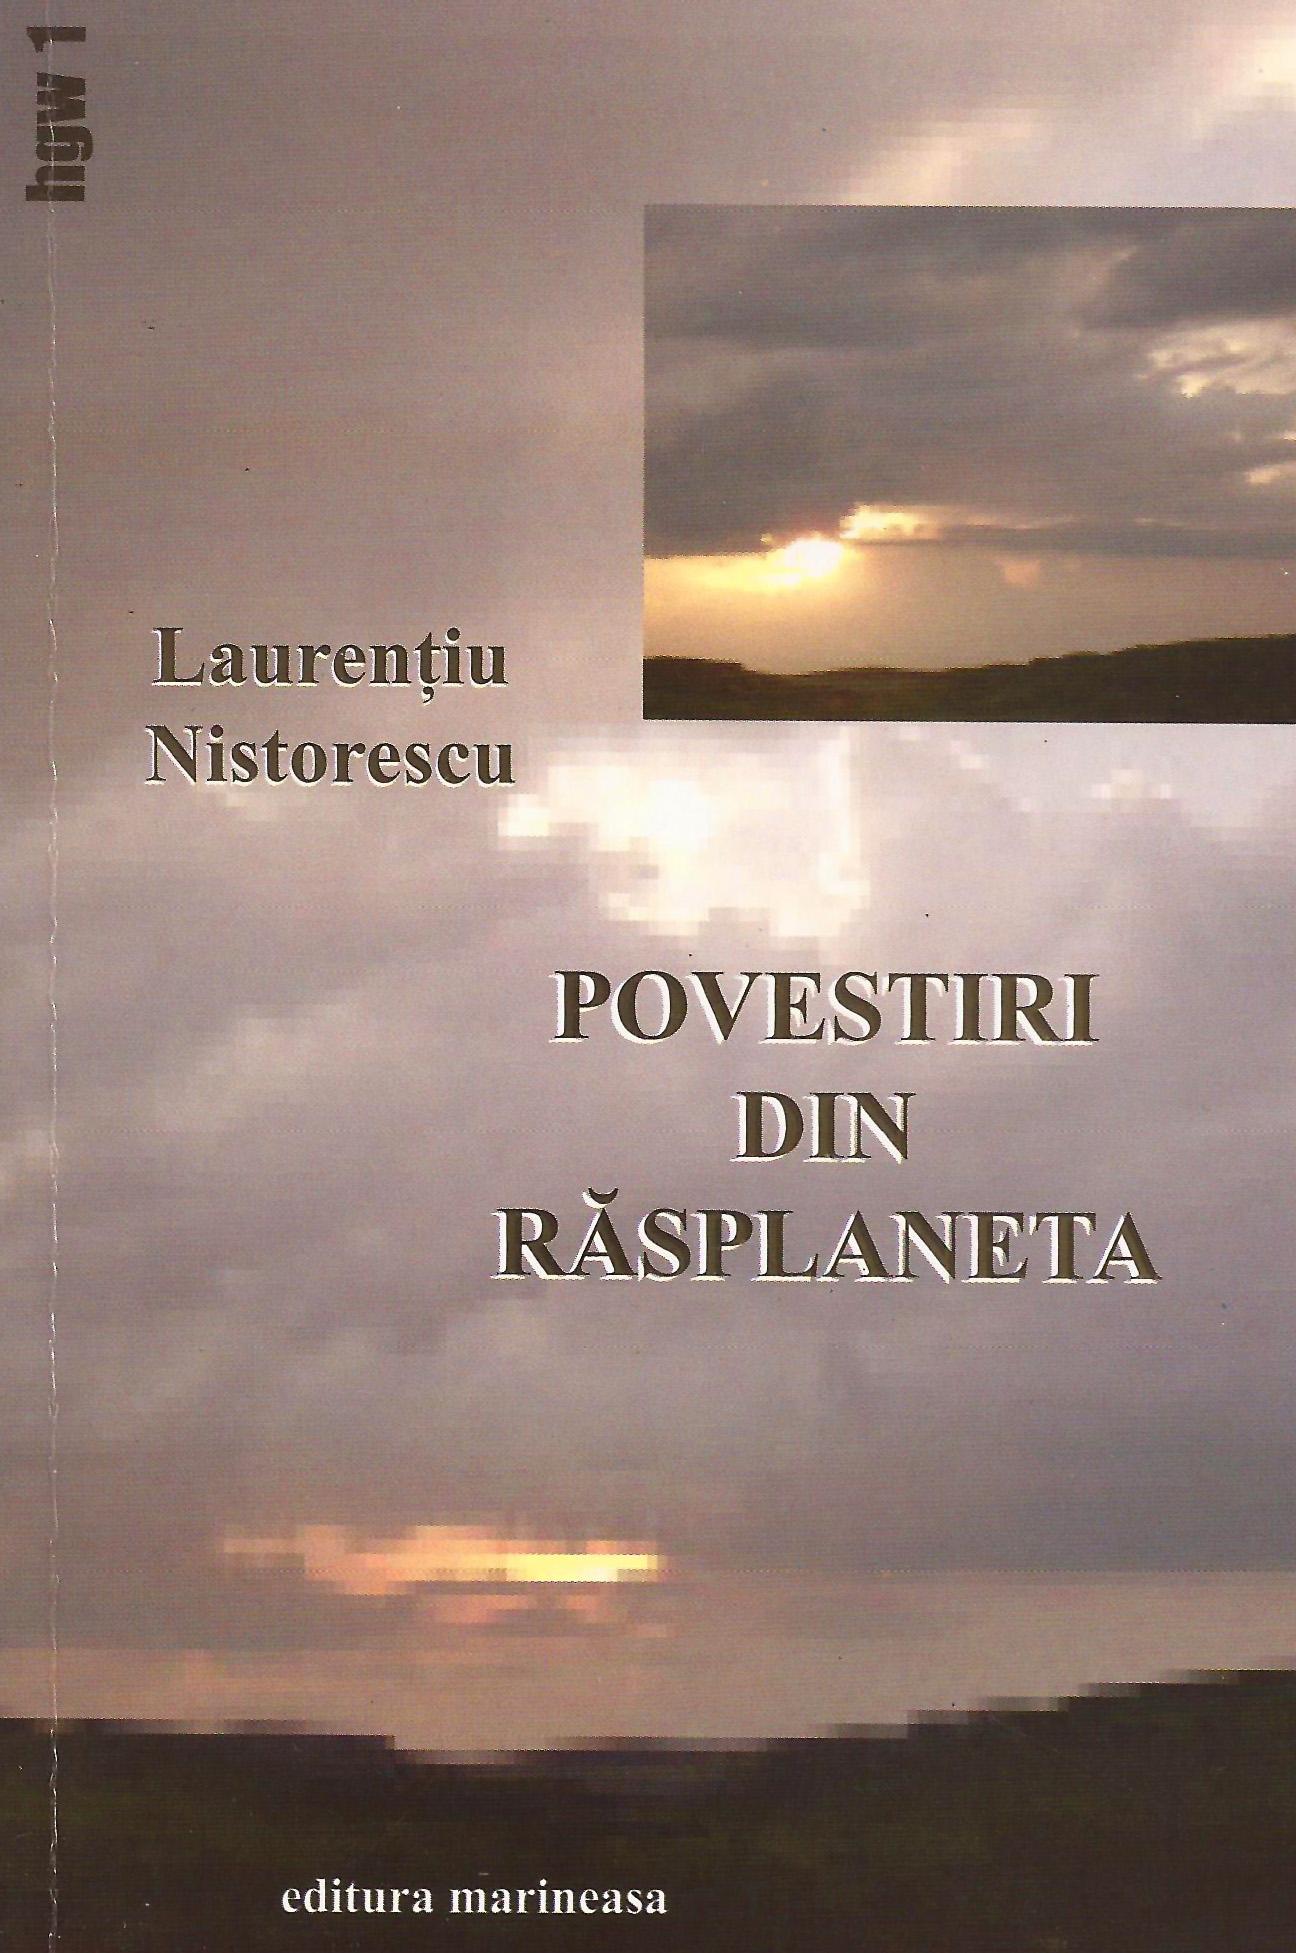 Laurenţiu Nistorescu: Povestiri din Răsplaneta